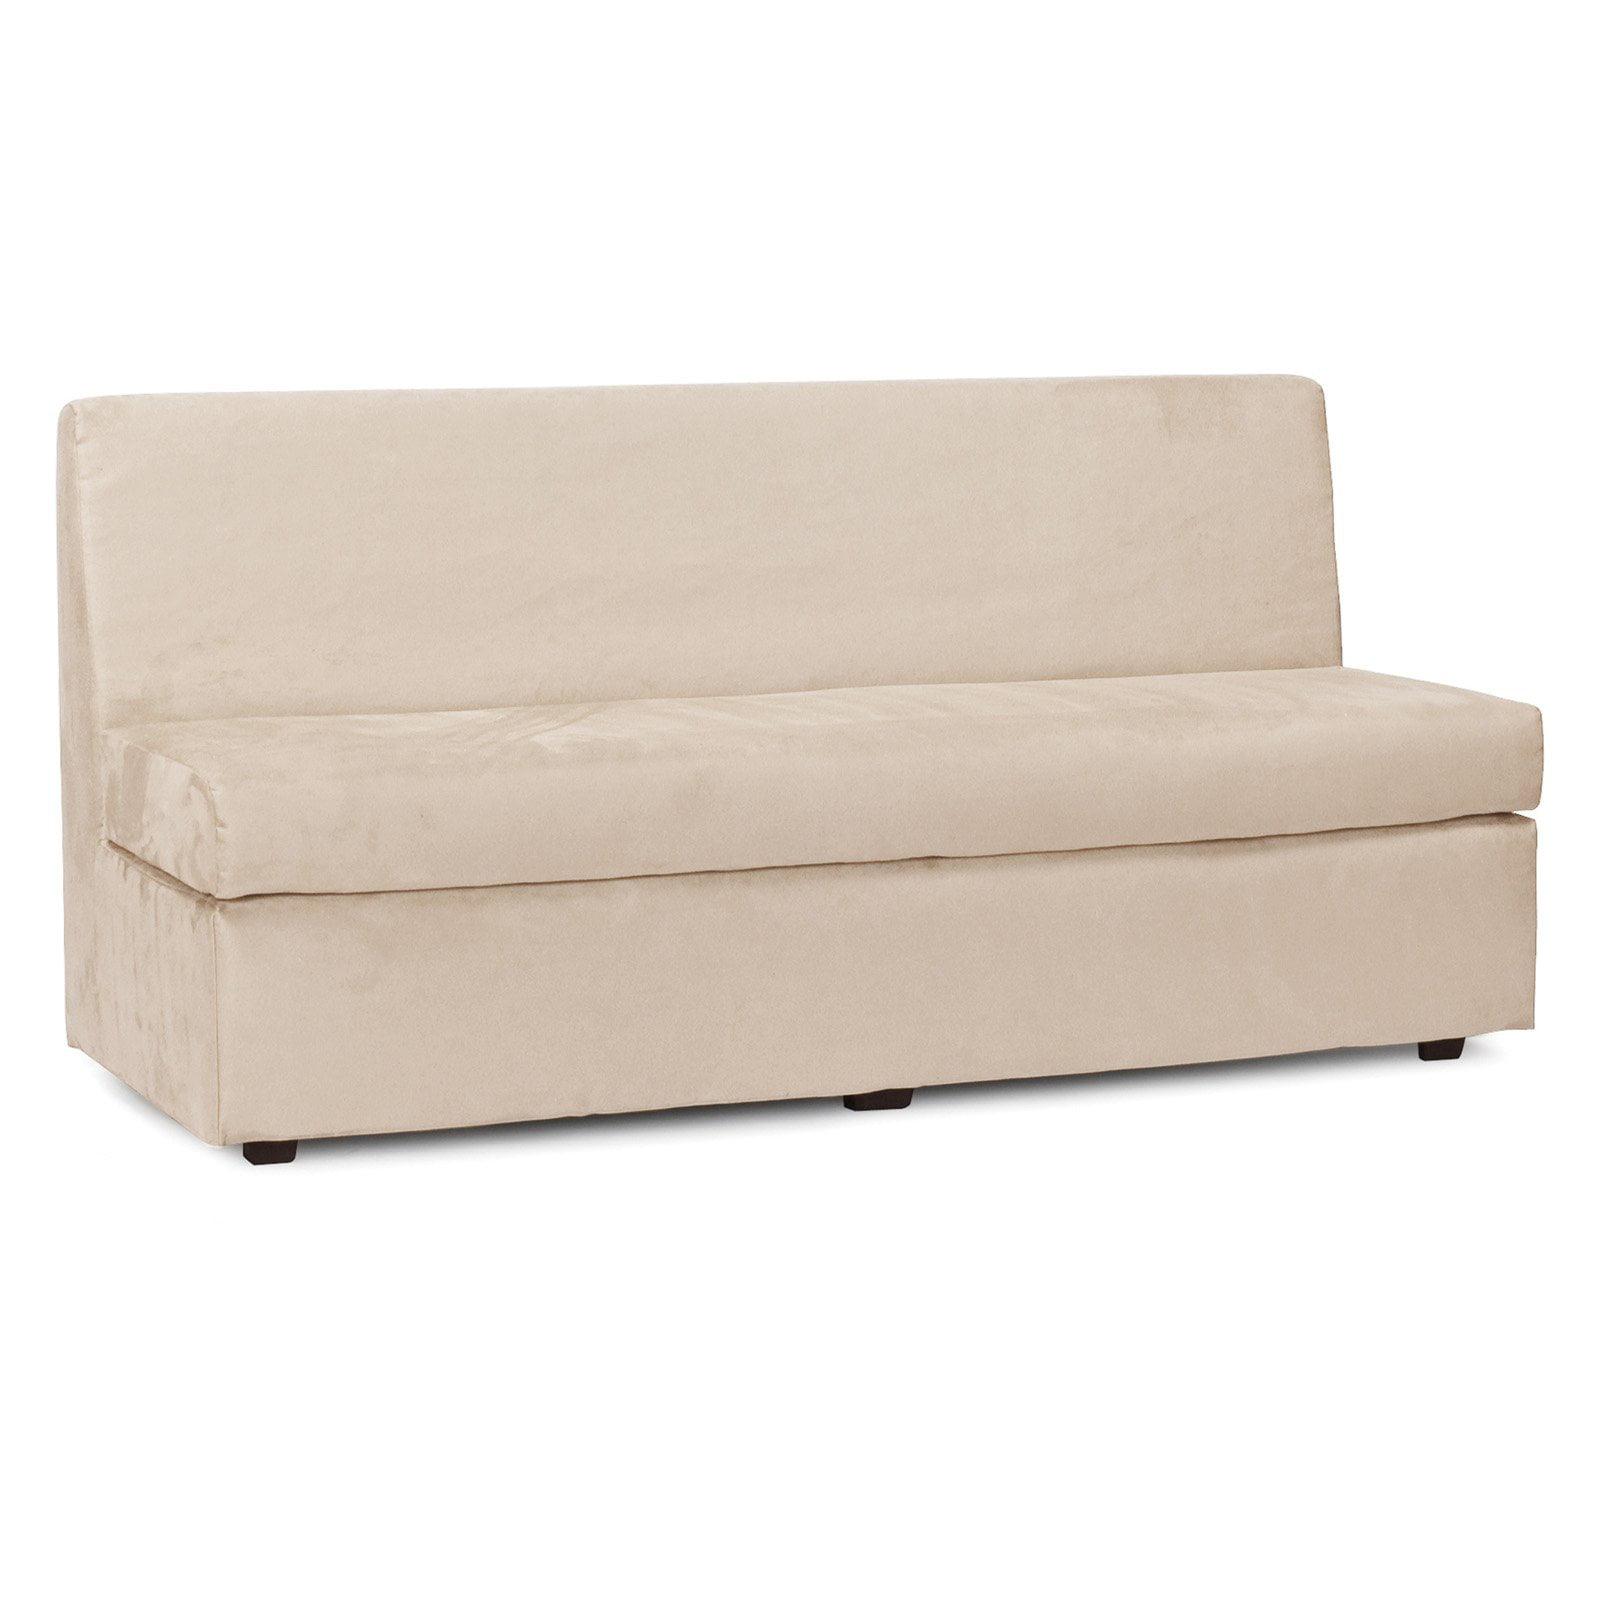 Elizabeth Austin Bella Slipper Sofa by Howard Elliot